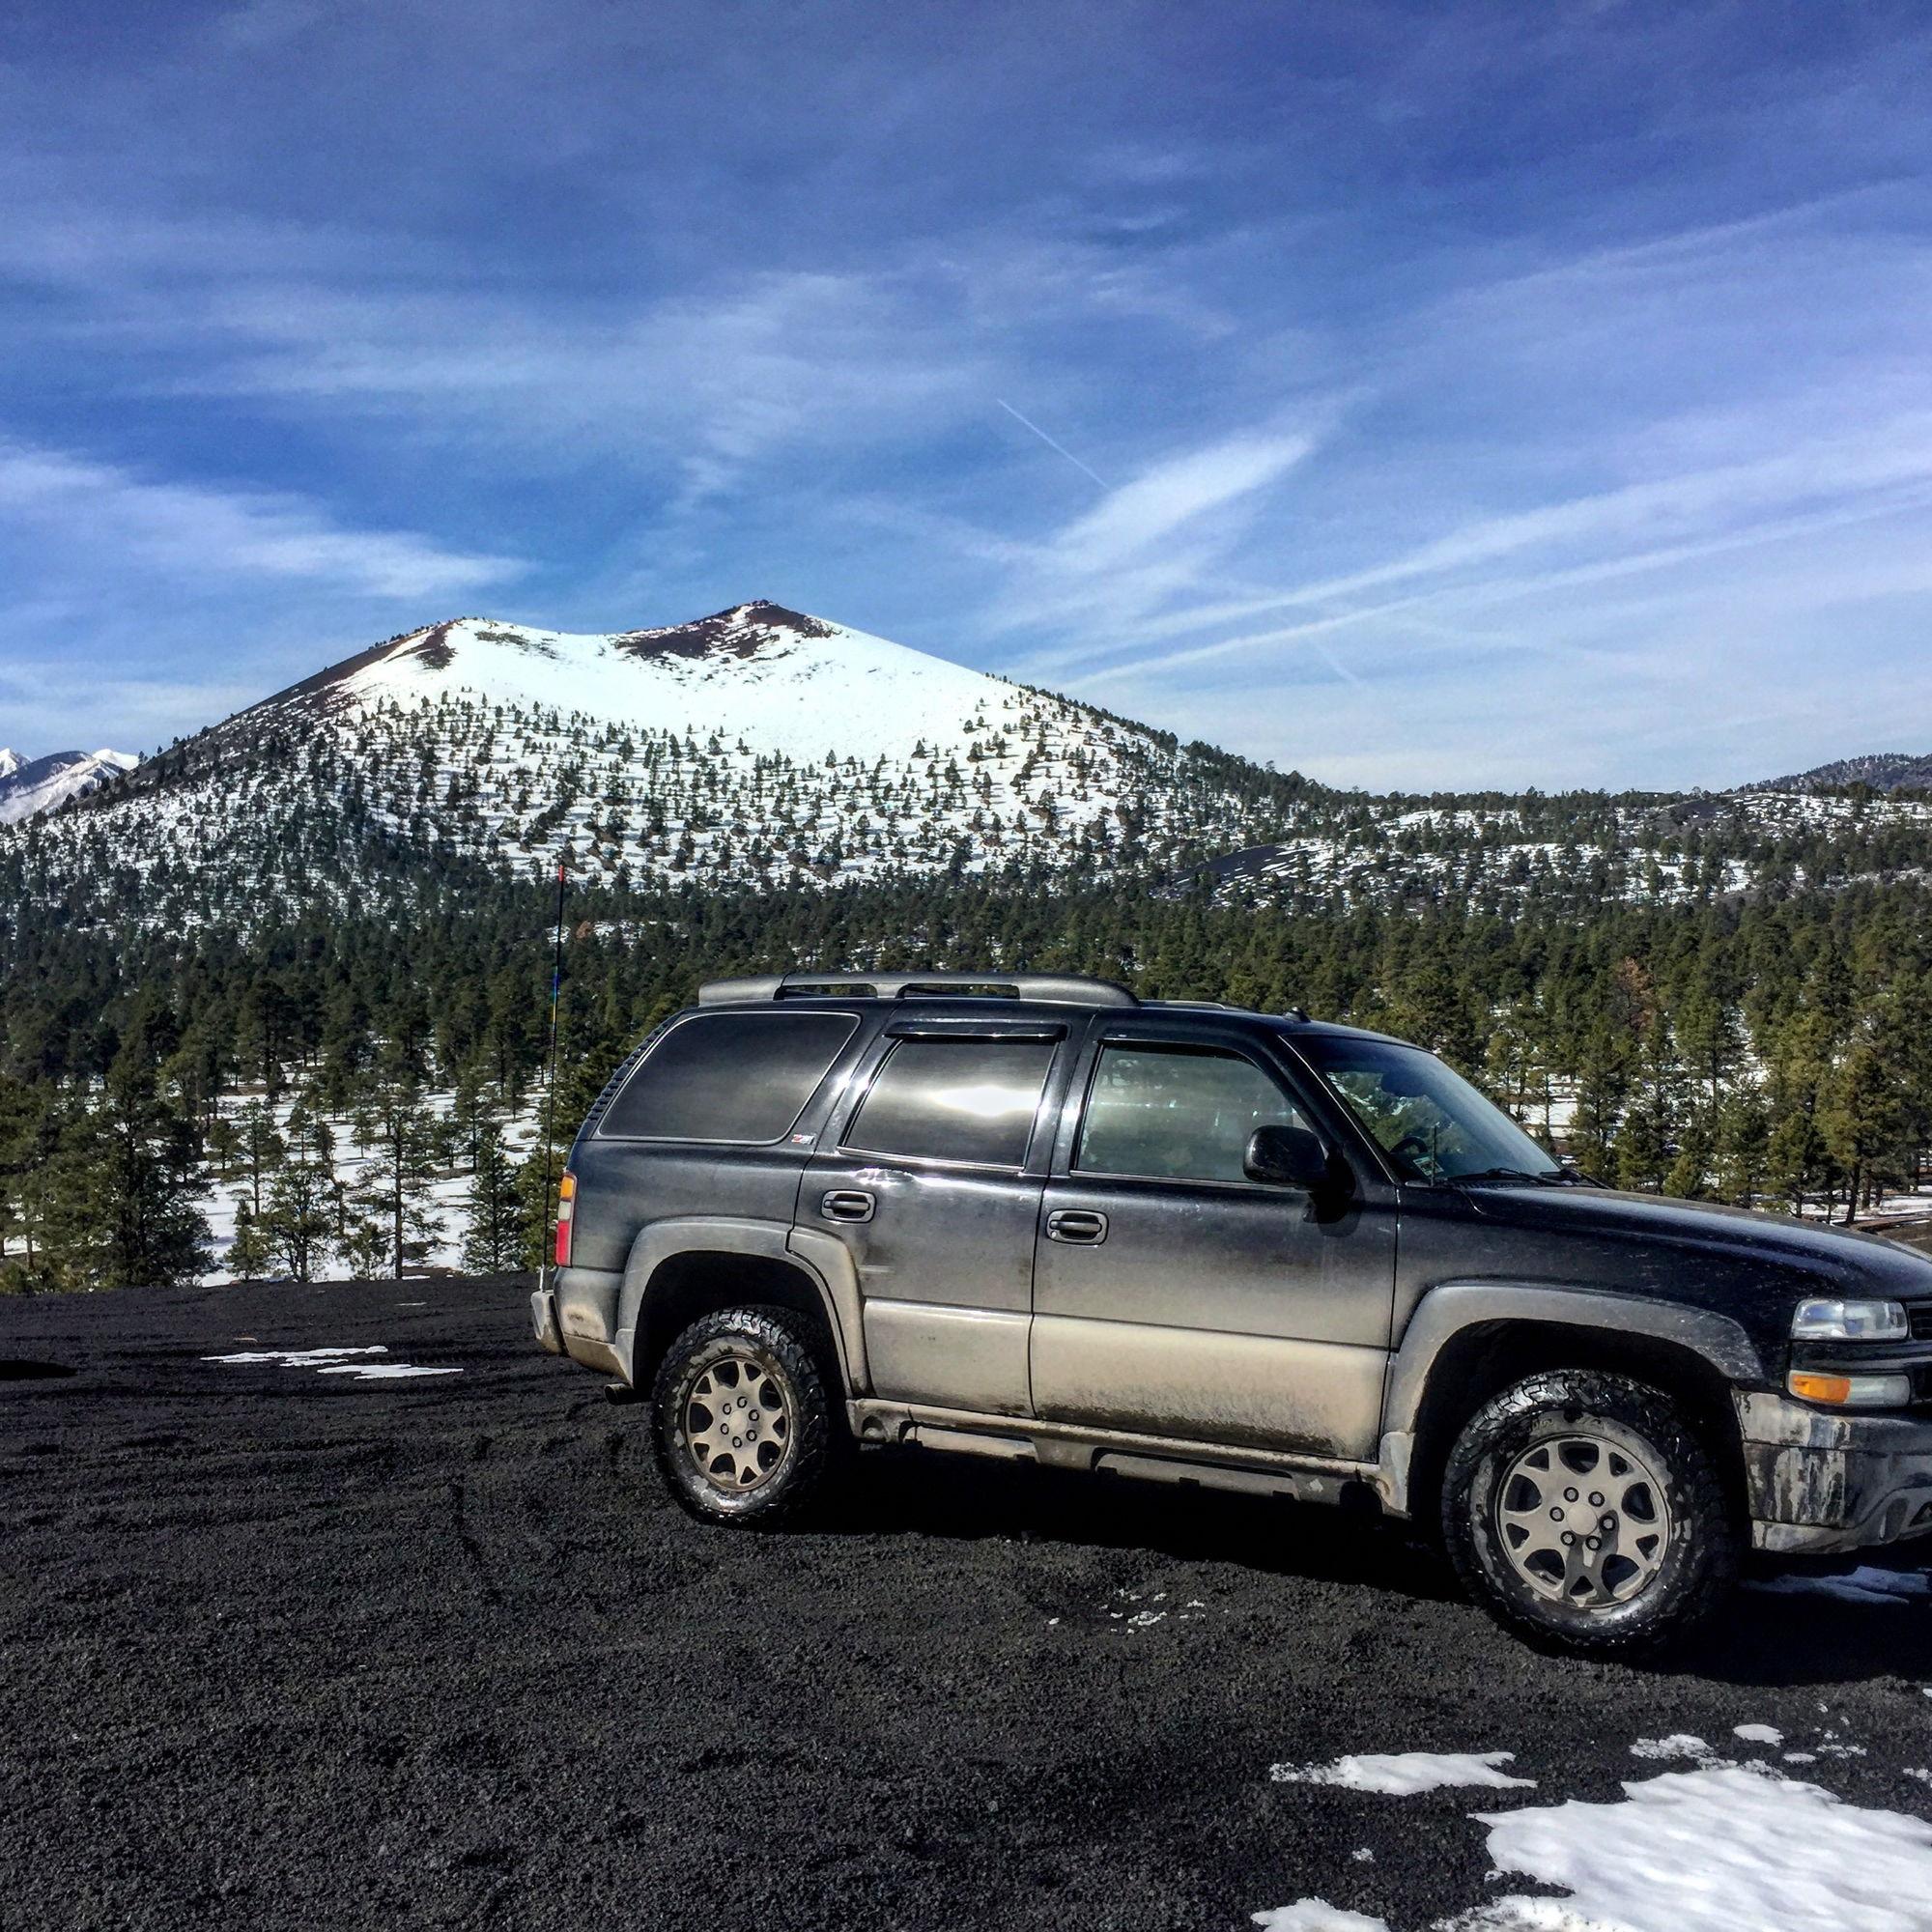 Chevrolet Flagstaff: Show Your Hoe/burb! Post Them Pics Boys!